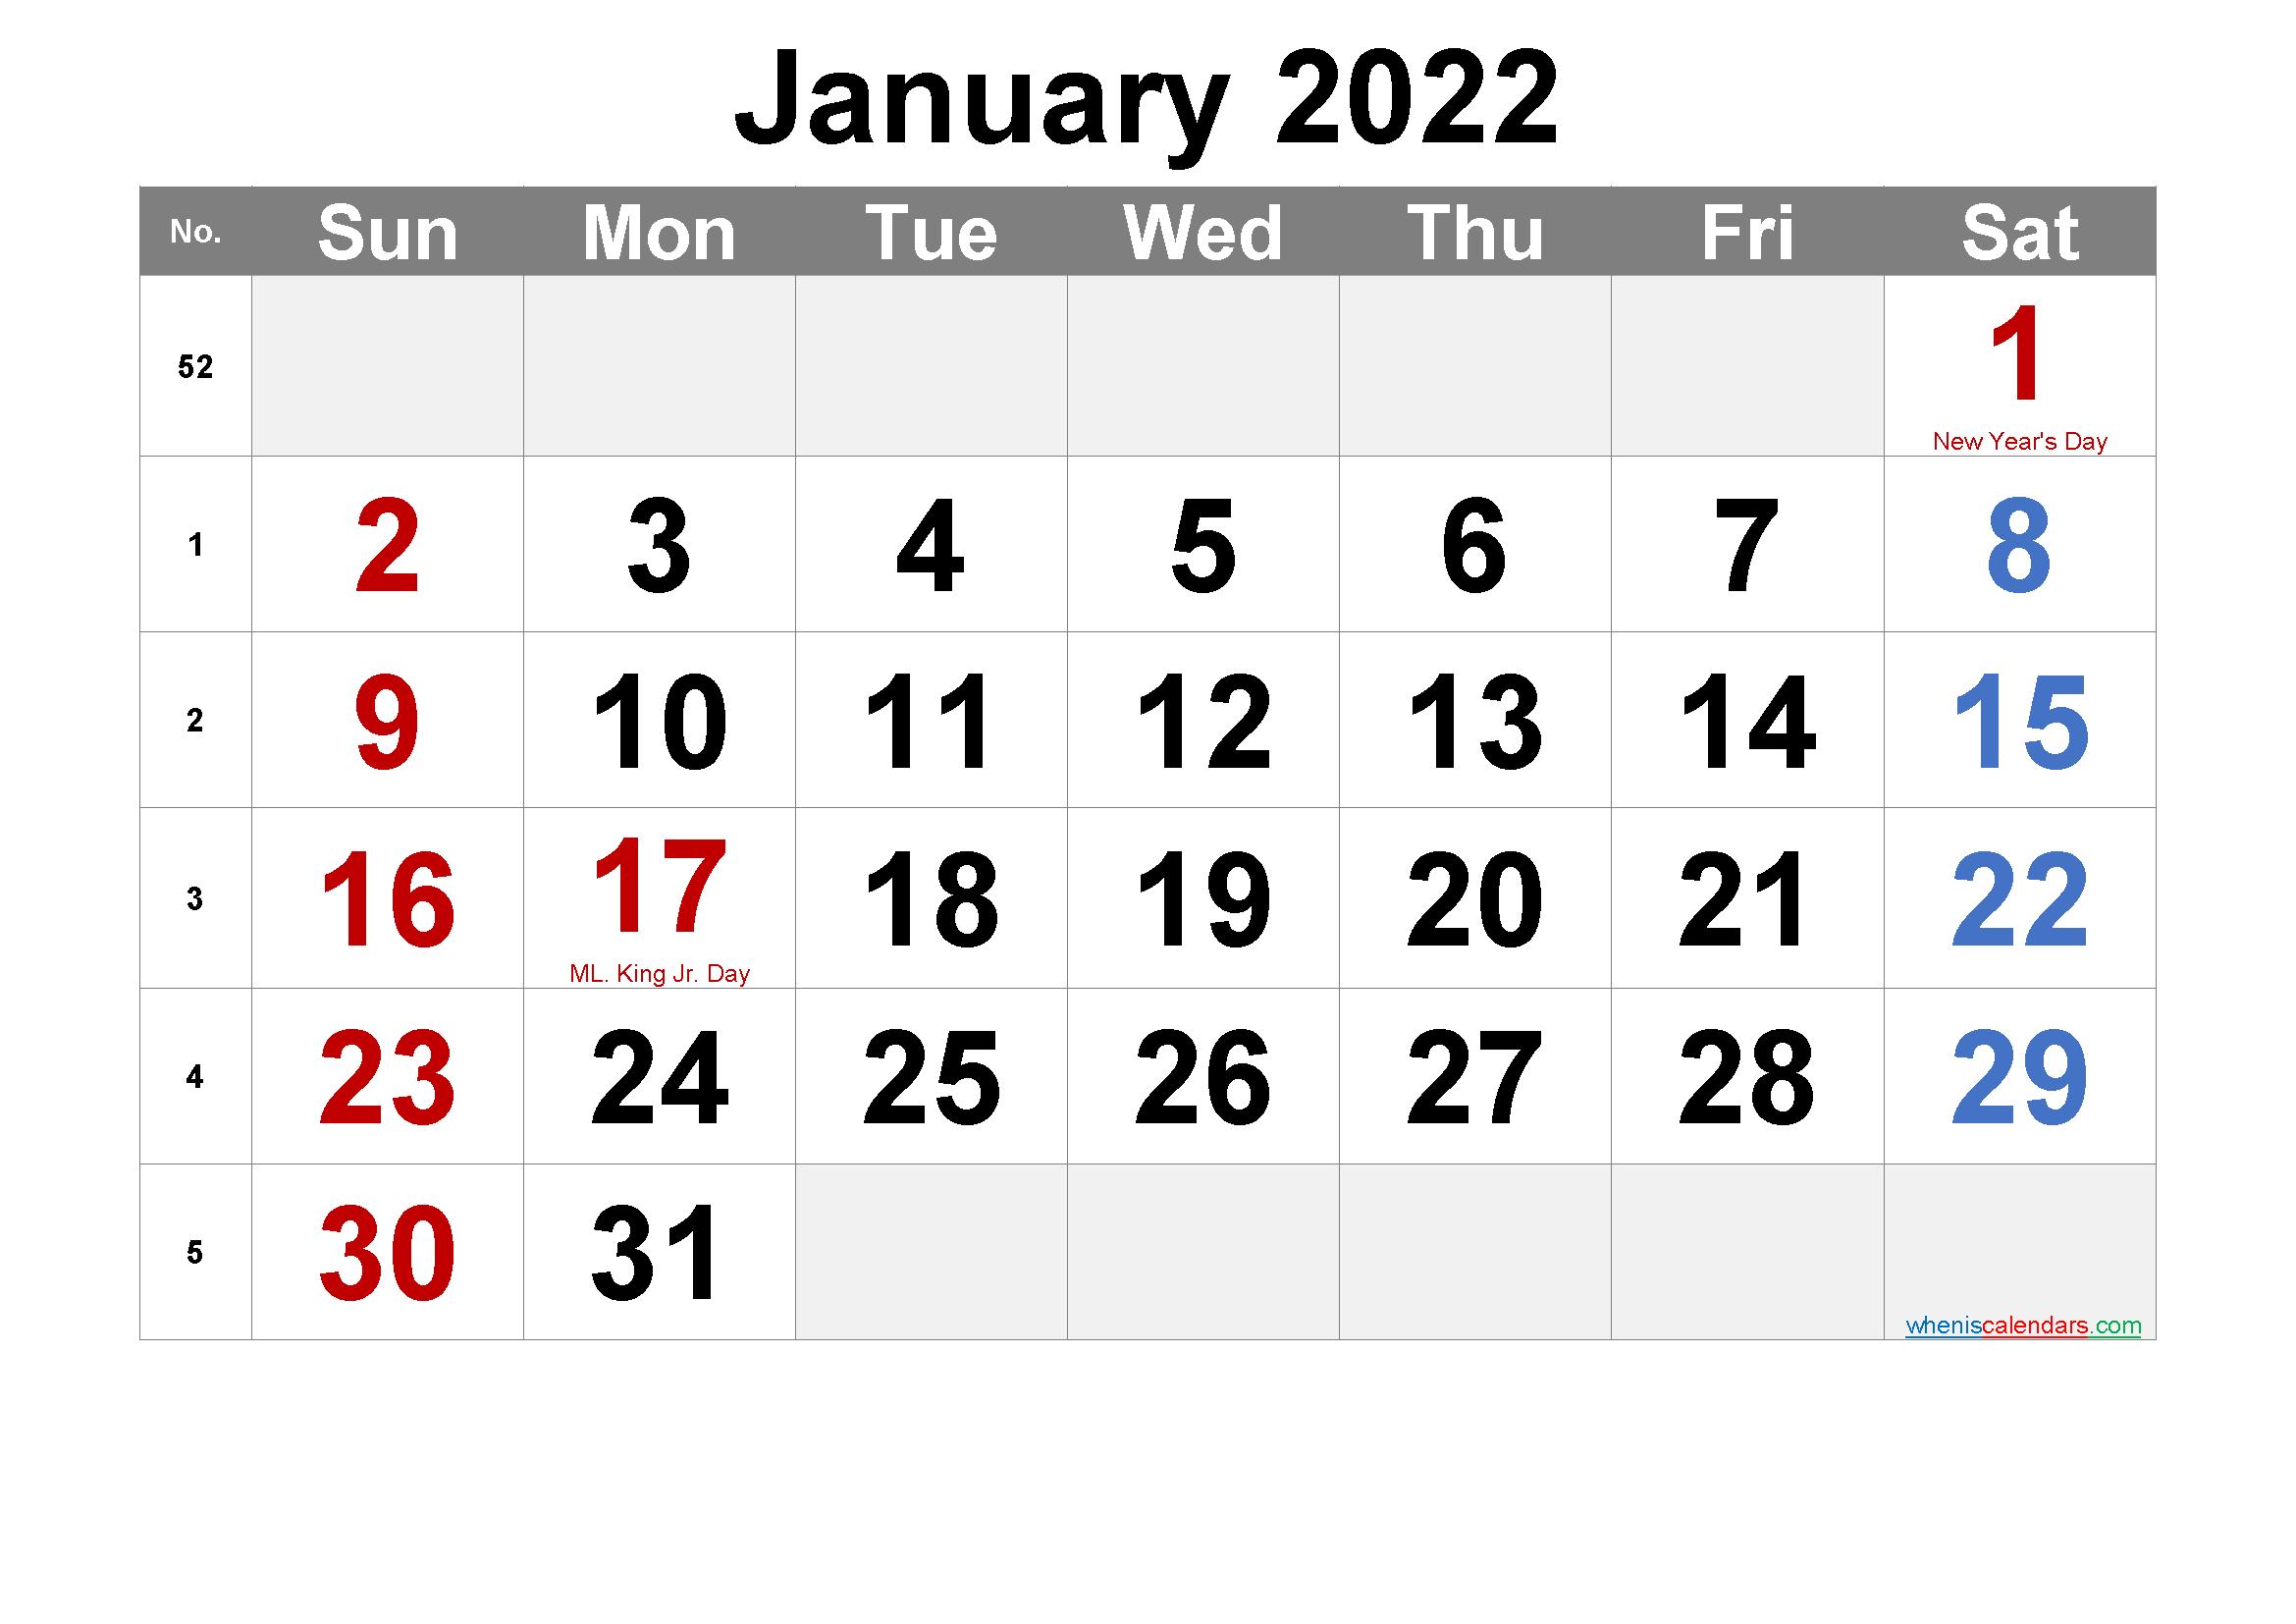 July 4 2022 Calendar.Free Printable January 2022 Calendar Pdf And Png Calendar Printables Printable Calendar July Monthly Calendar Printable